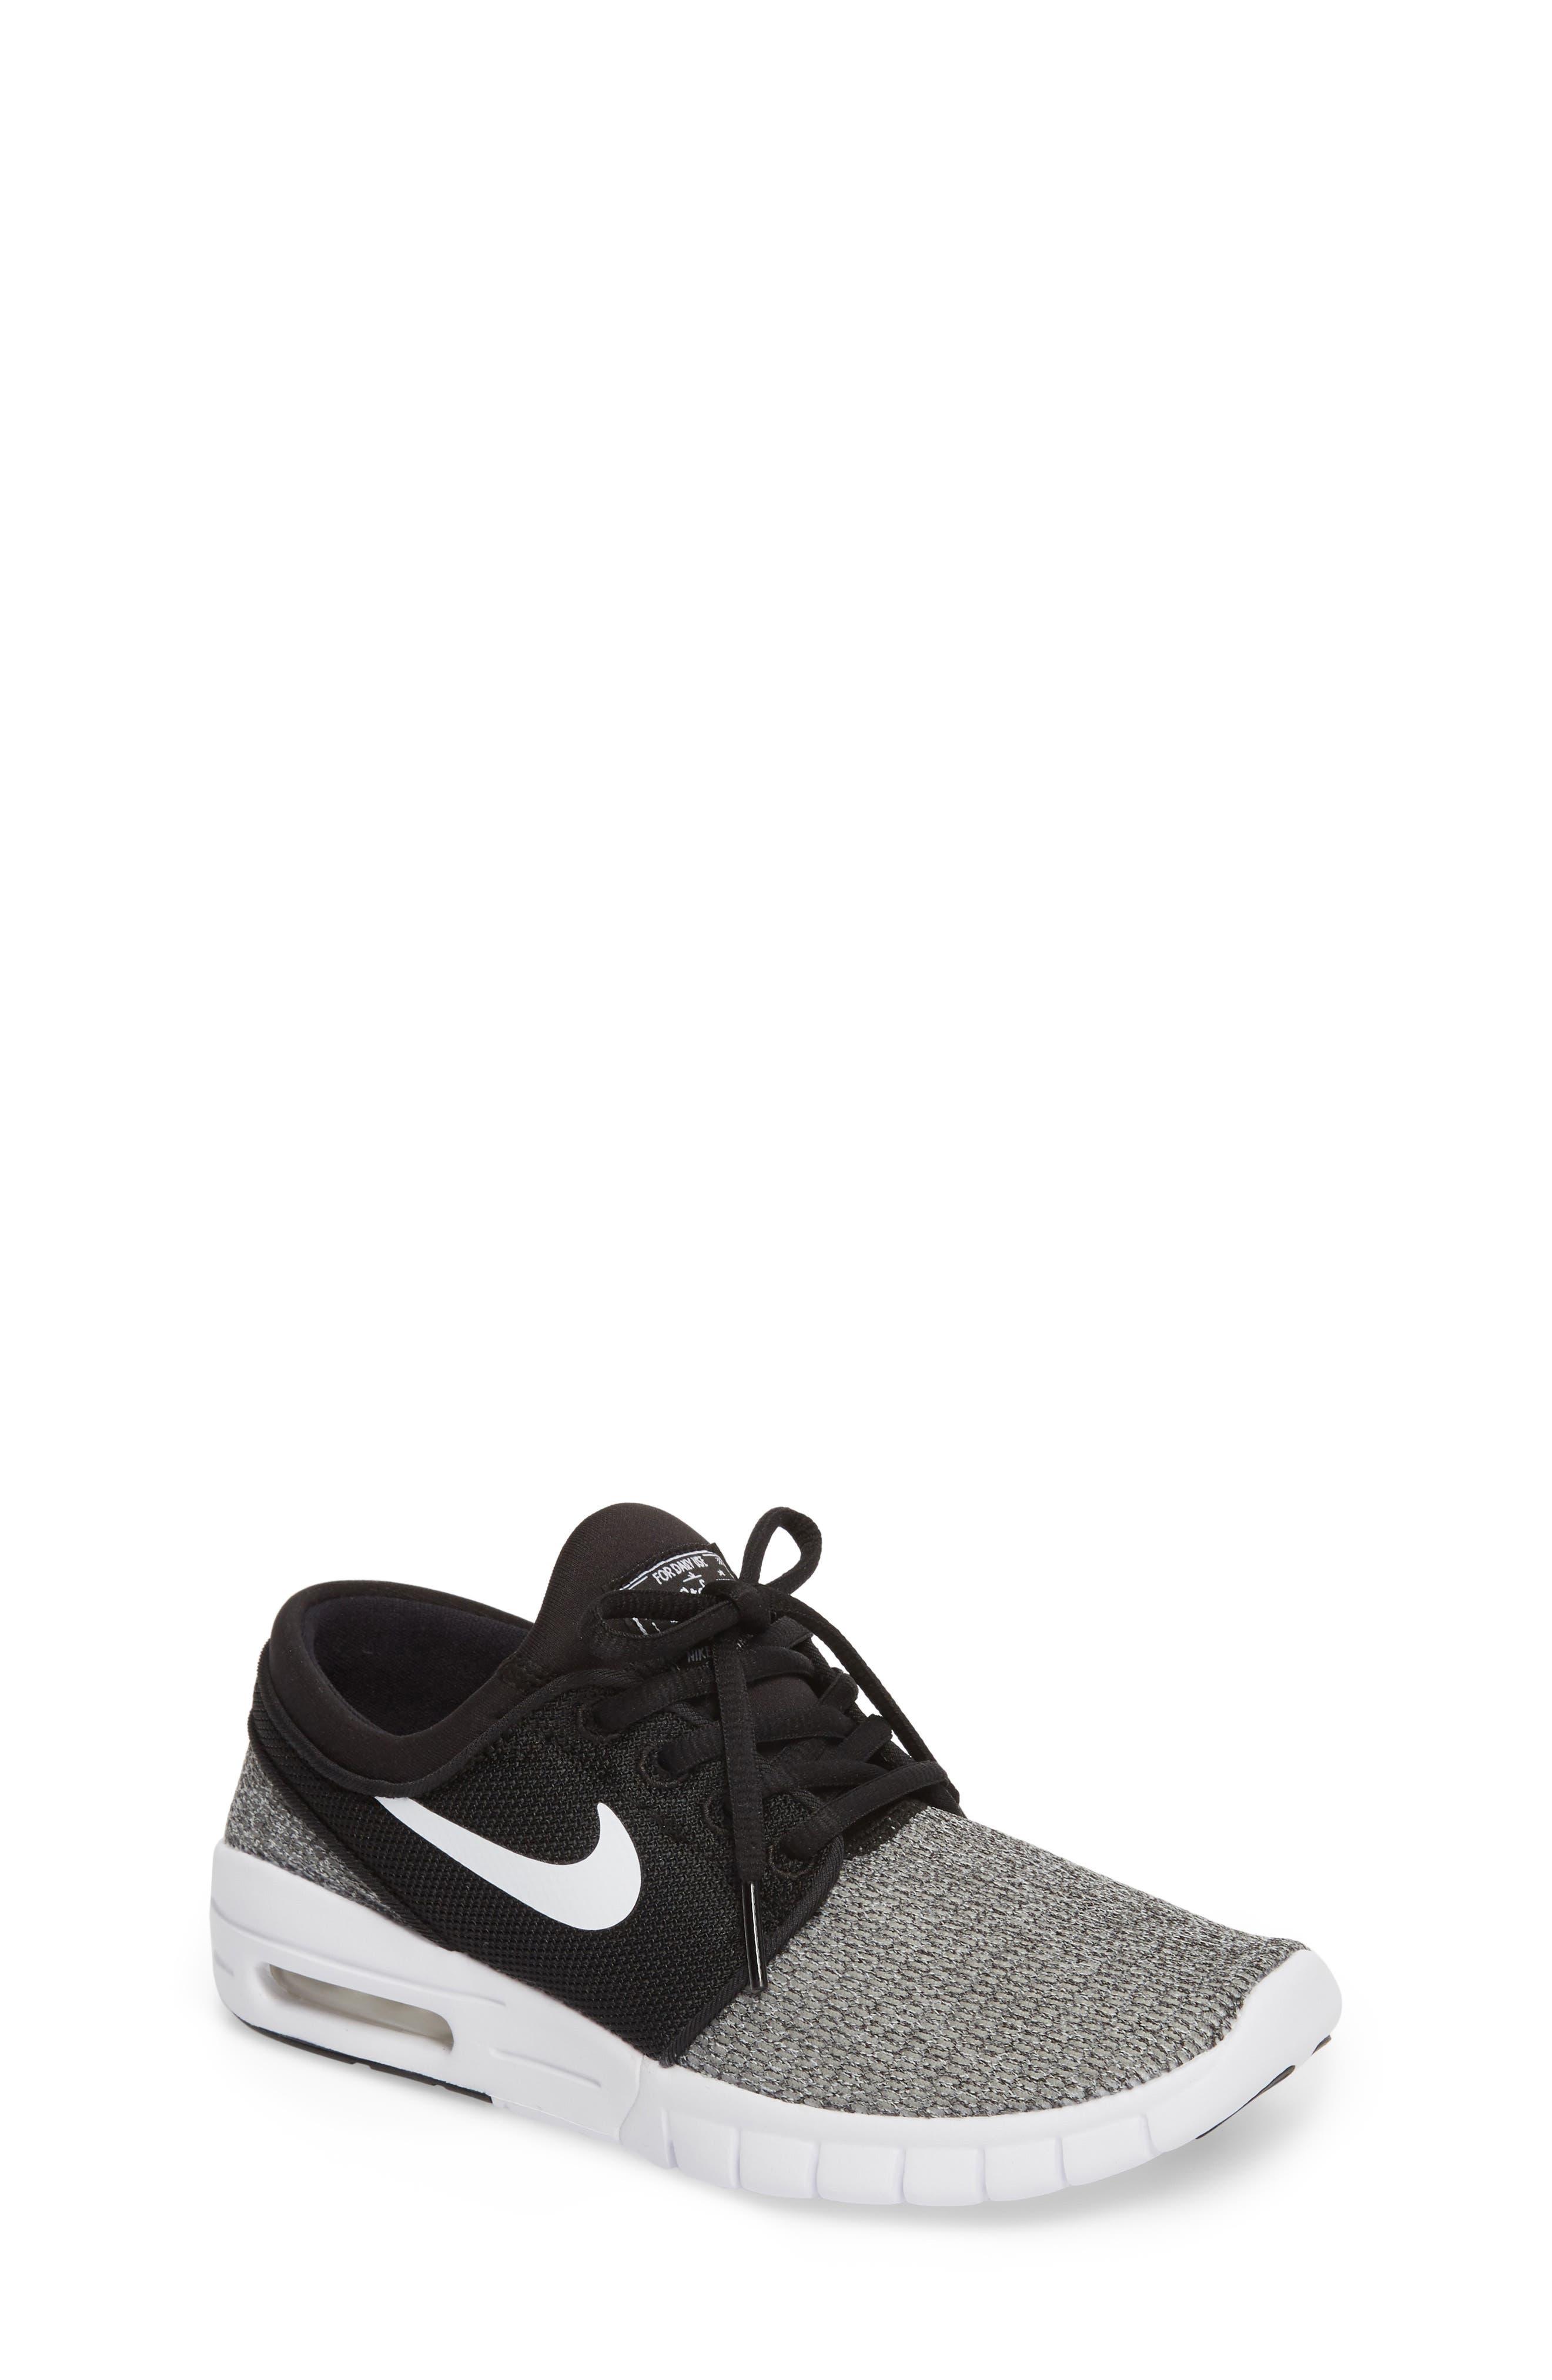 Stefan Janoski Max SB Skate Sneaker,                             Main thumbnail 1, color,                             Black/ White/ White